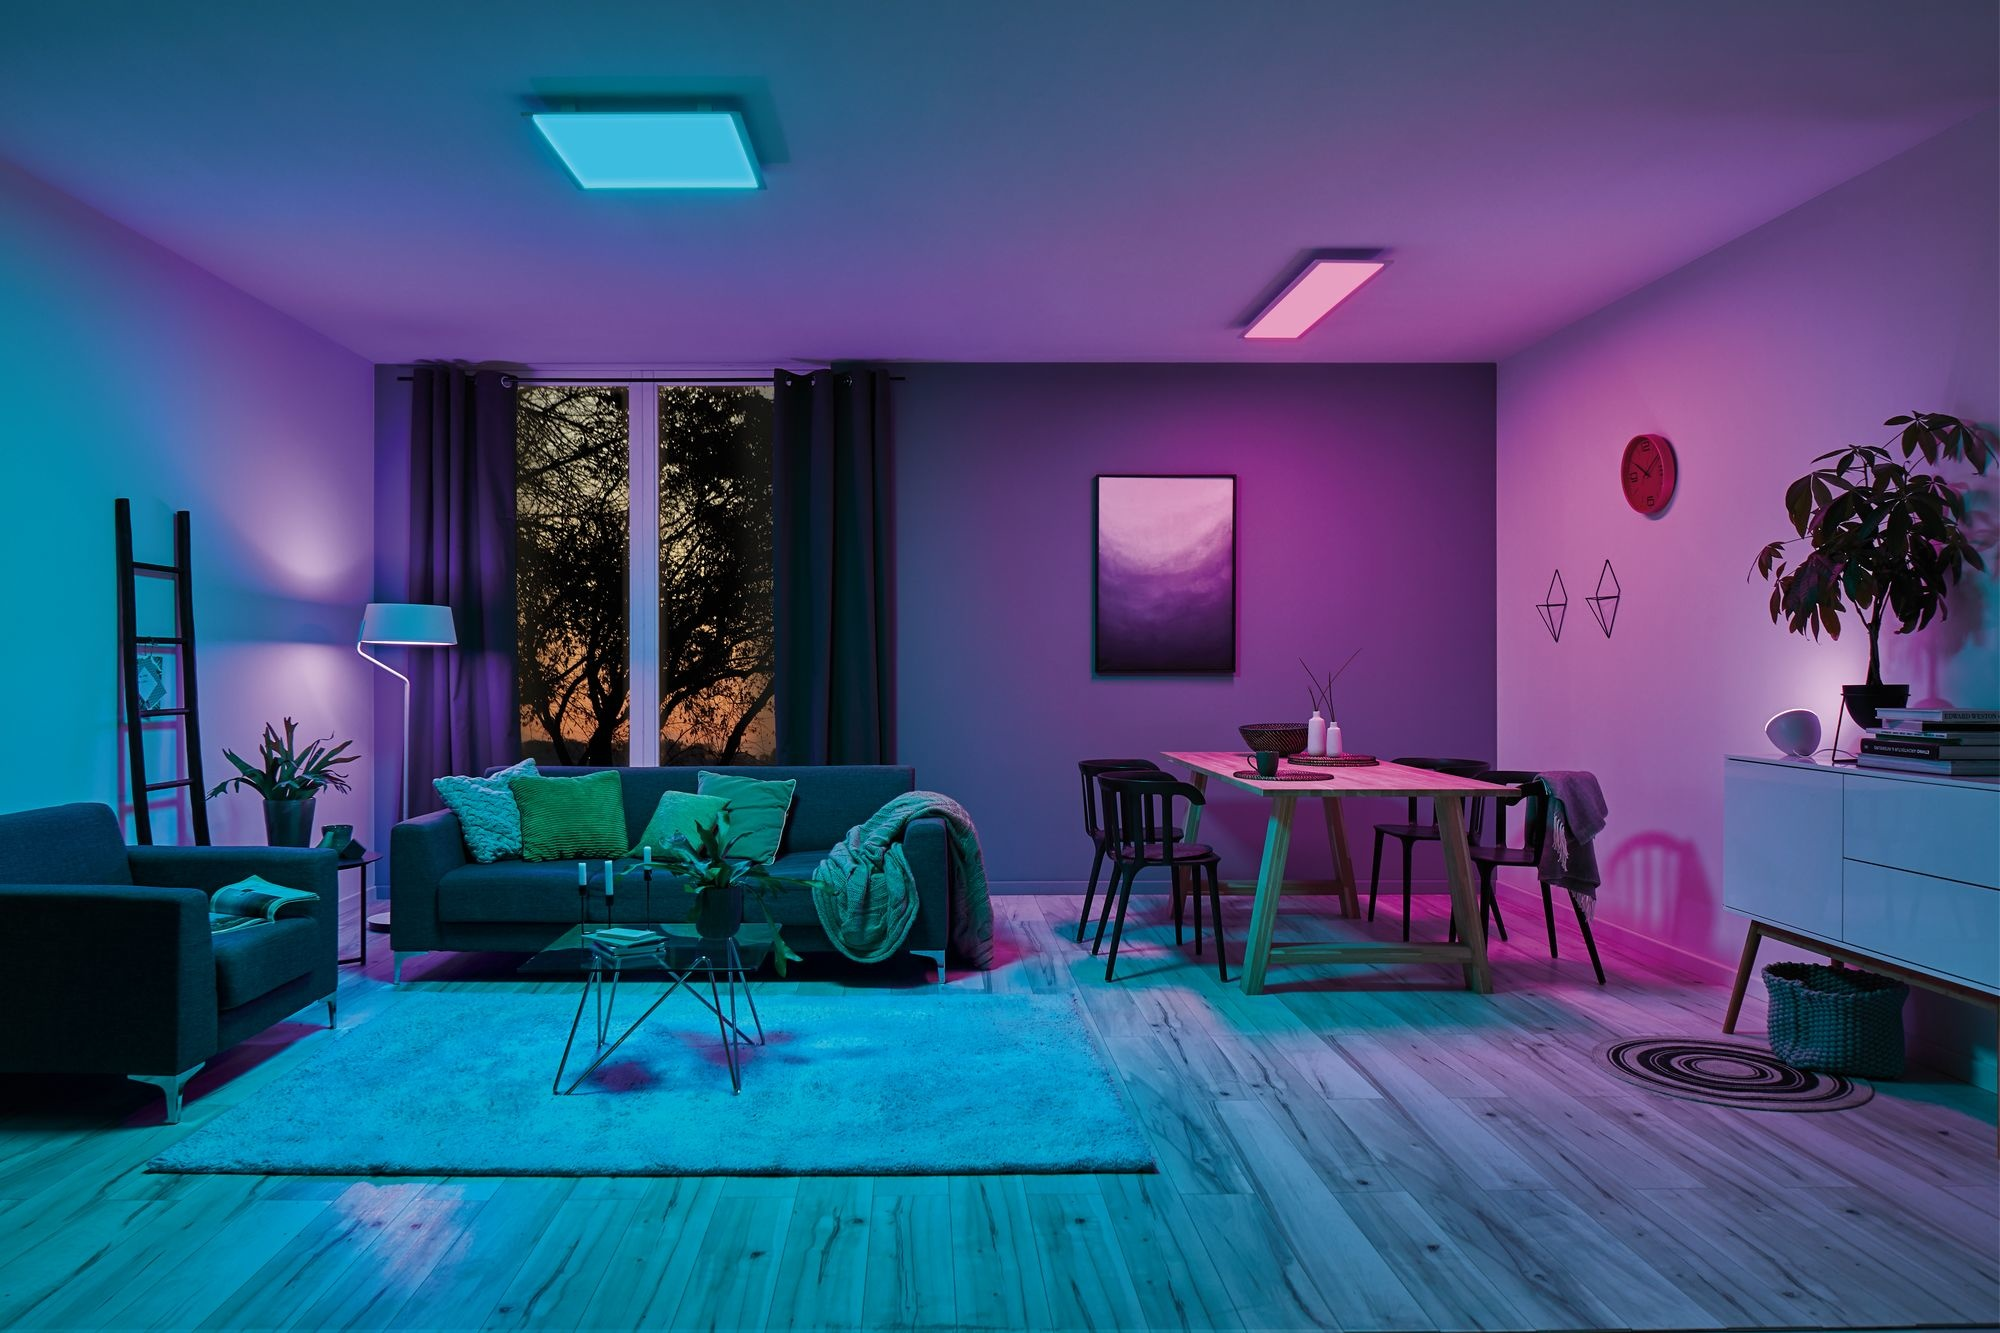 Paulmann LED Panel Amaris SmartHome Zigbee 1200x300mm 35 W Weiß matt RGBW Farbwechsel